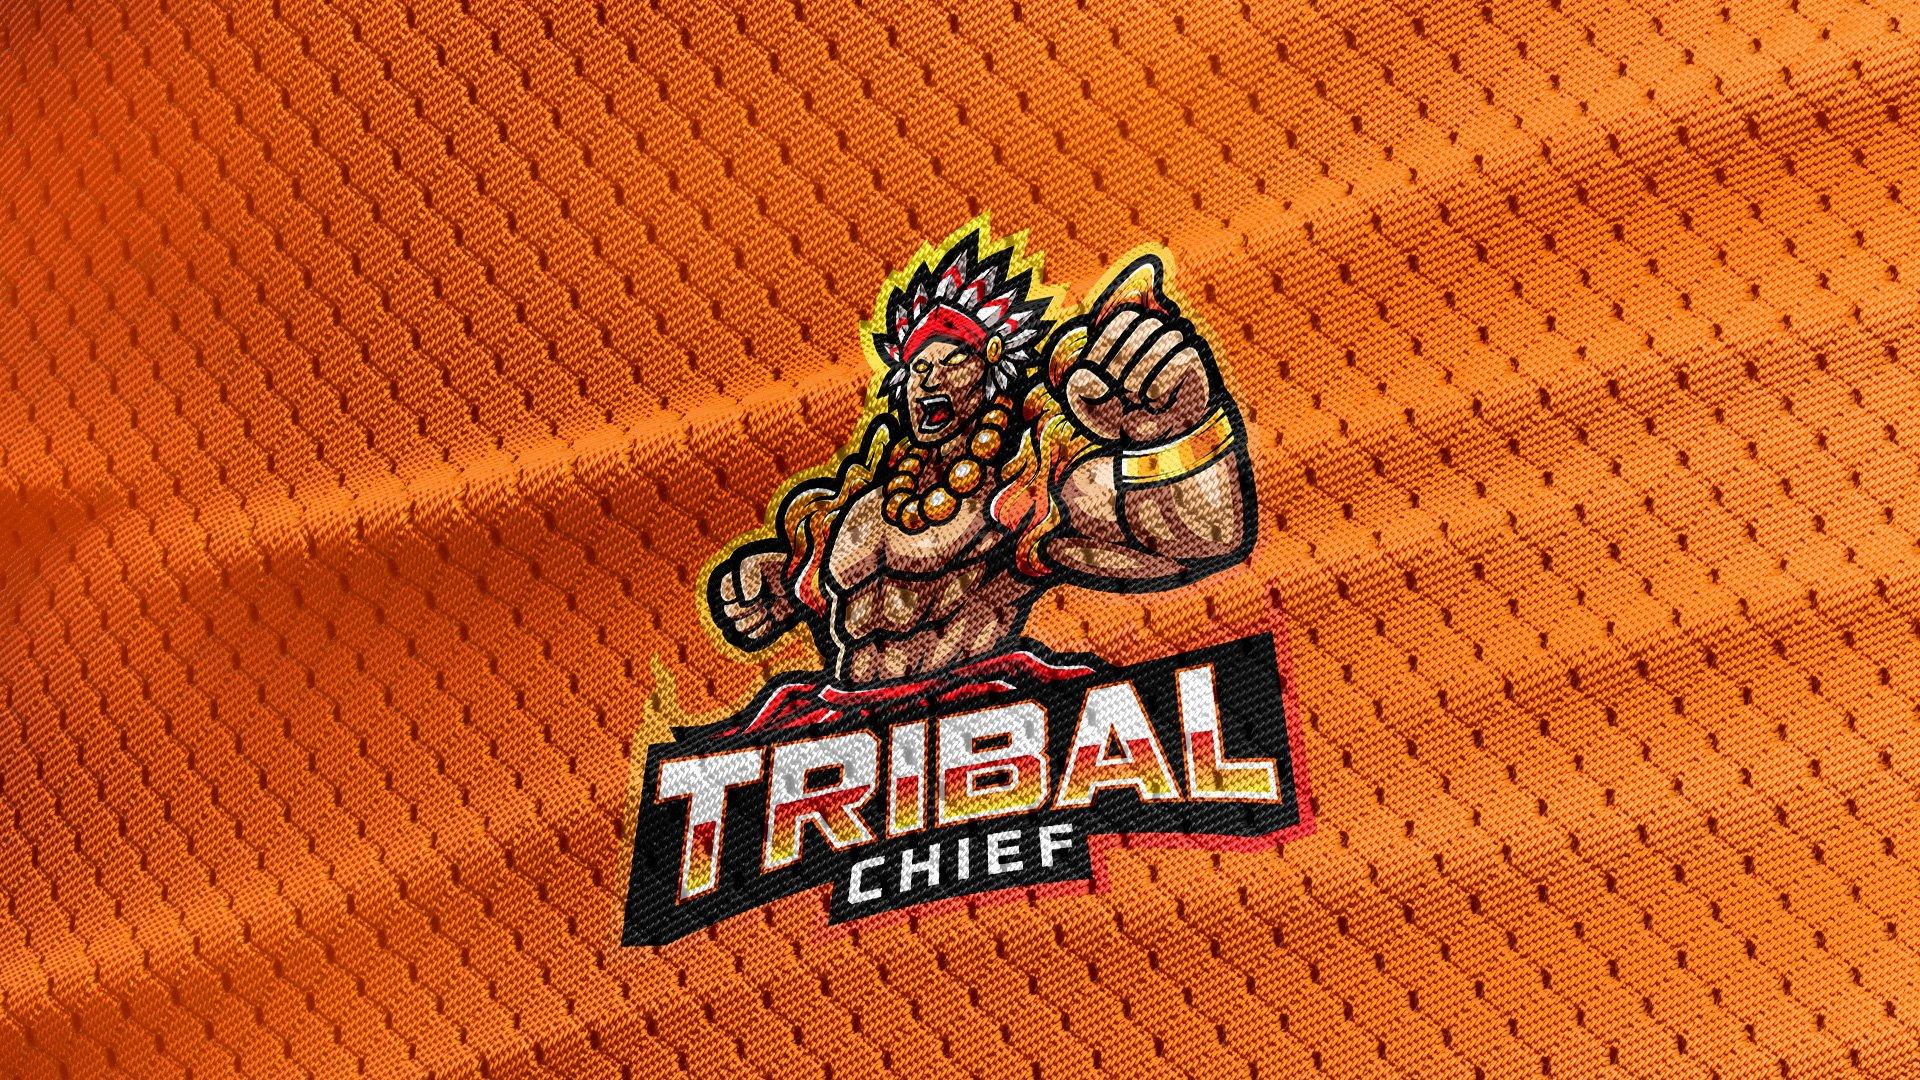 Orange-Jersey-Texture-Free-Download-Tribal-Chief-Logo-Mascot